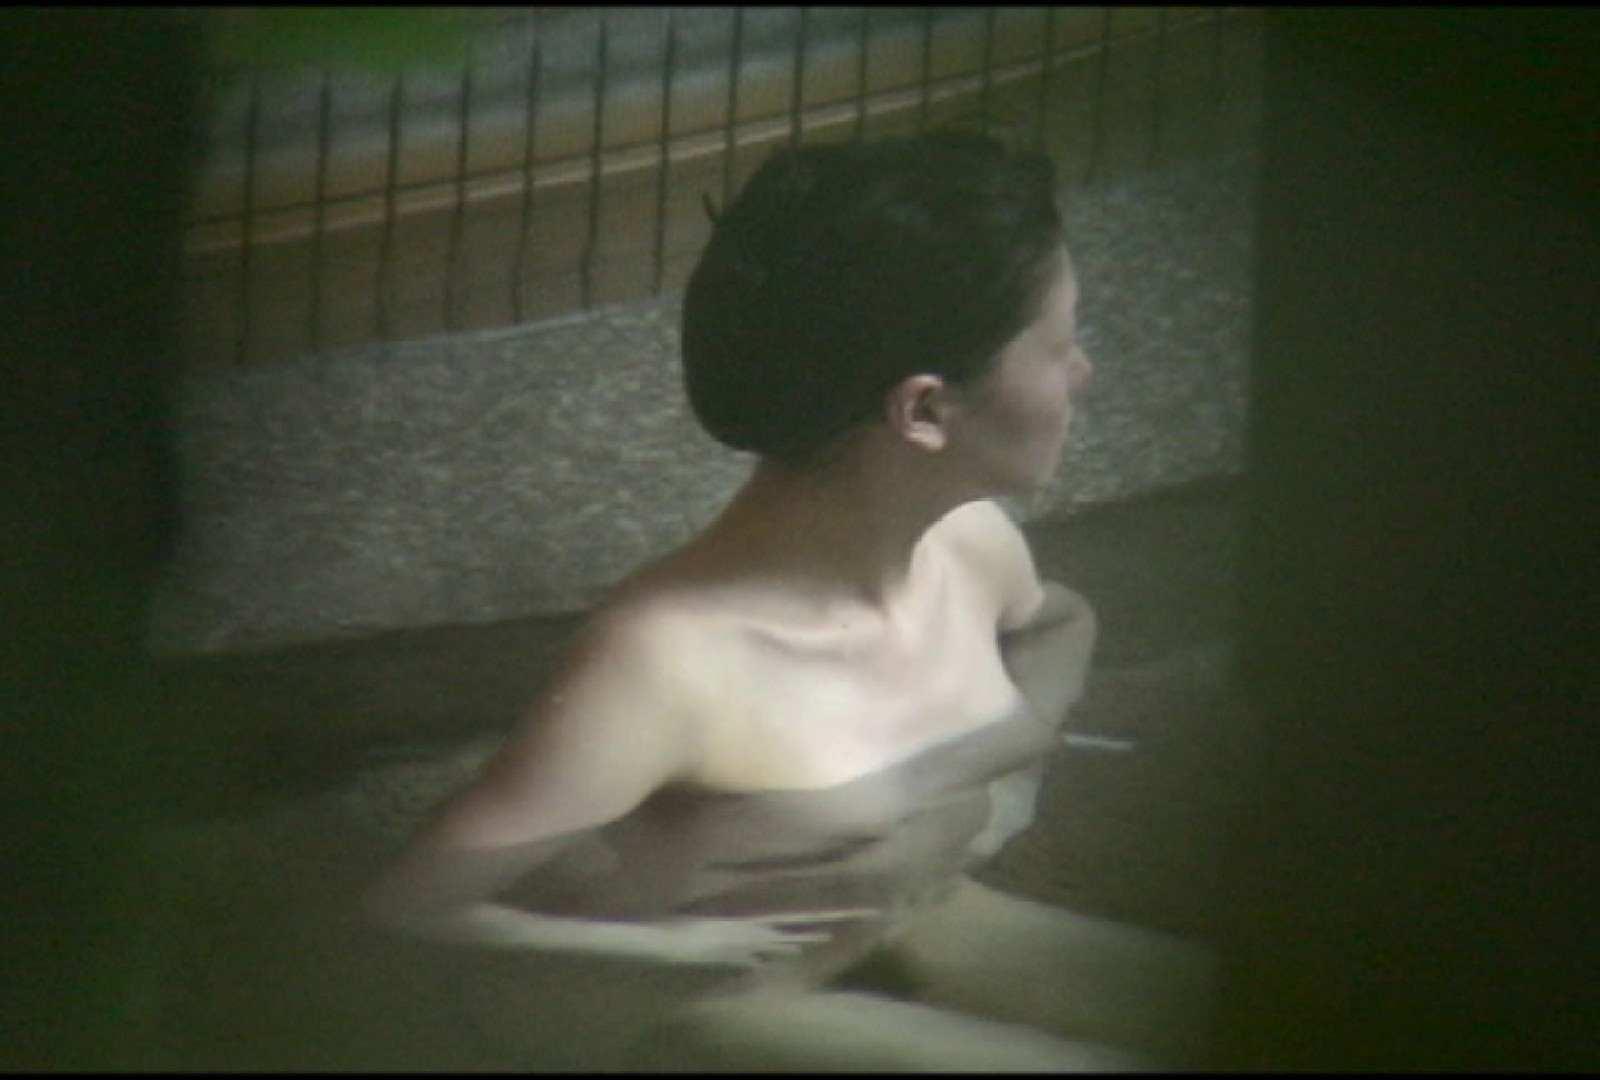 Aquaな露天風呂Vol.699 盗撮シリーズ   露天風呂編  93PIX 33